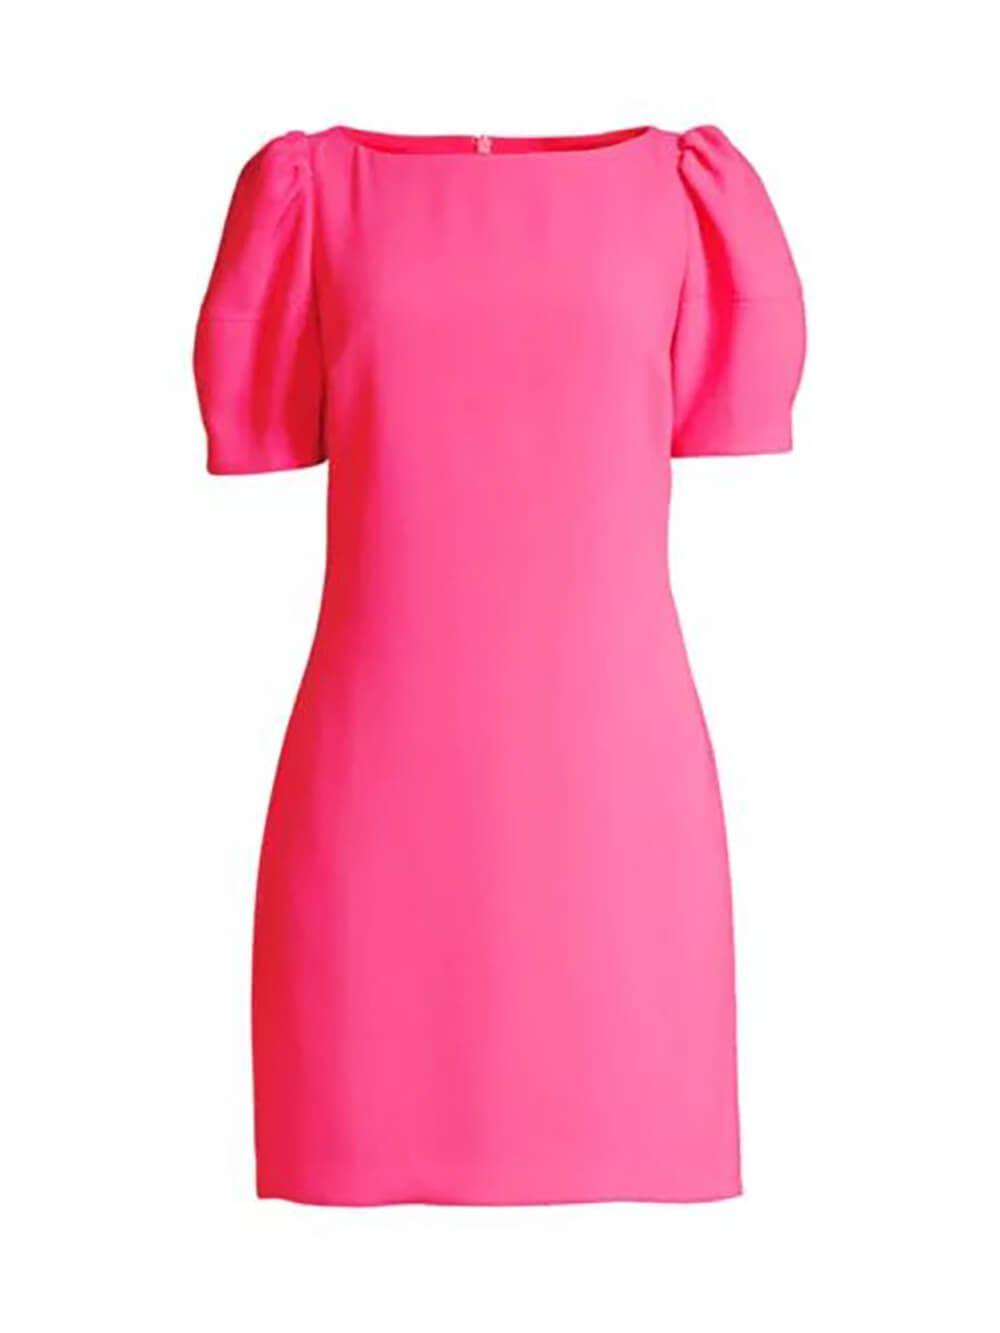 Bloom Short Sleeve Dress Item # 2001345CL1